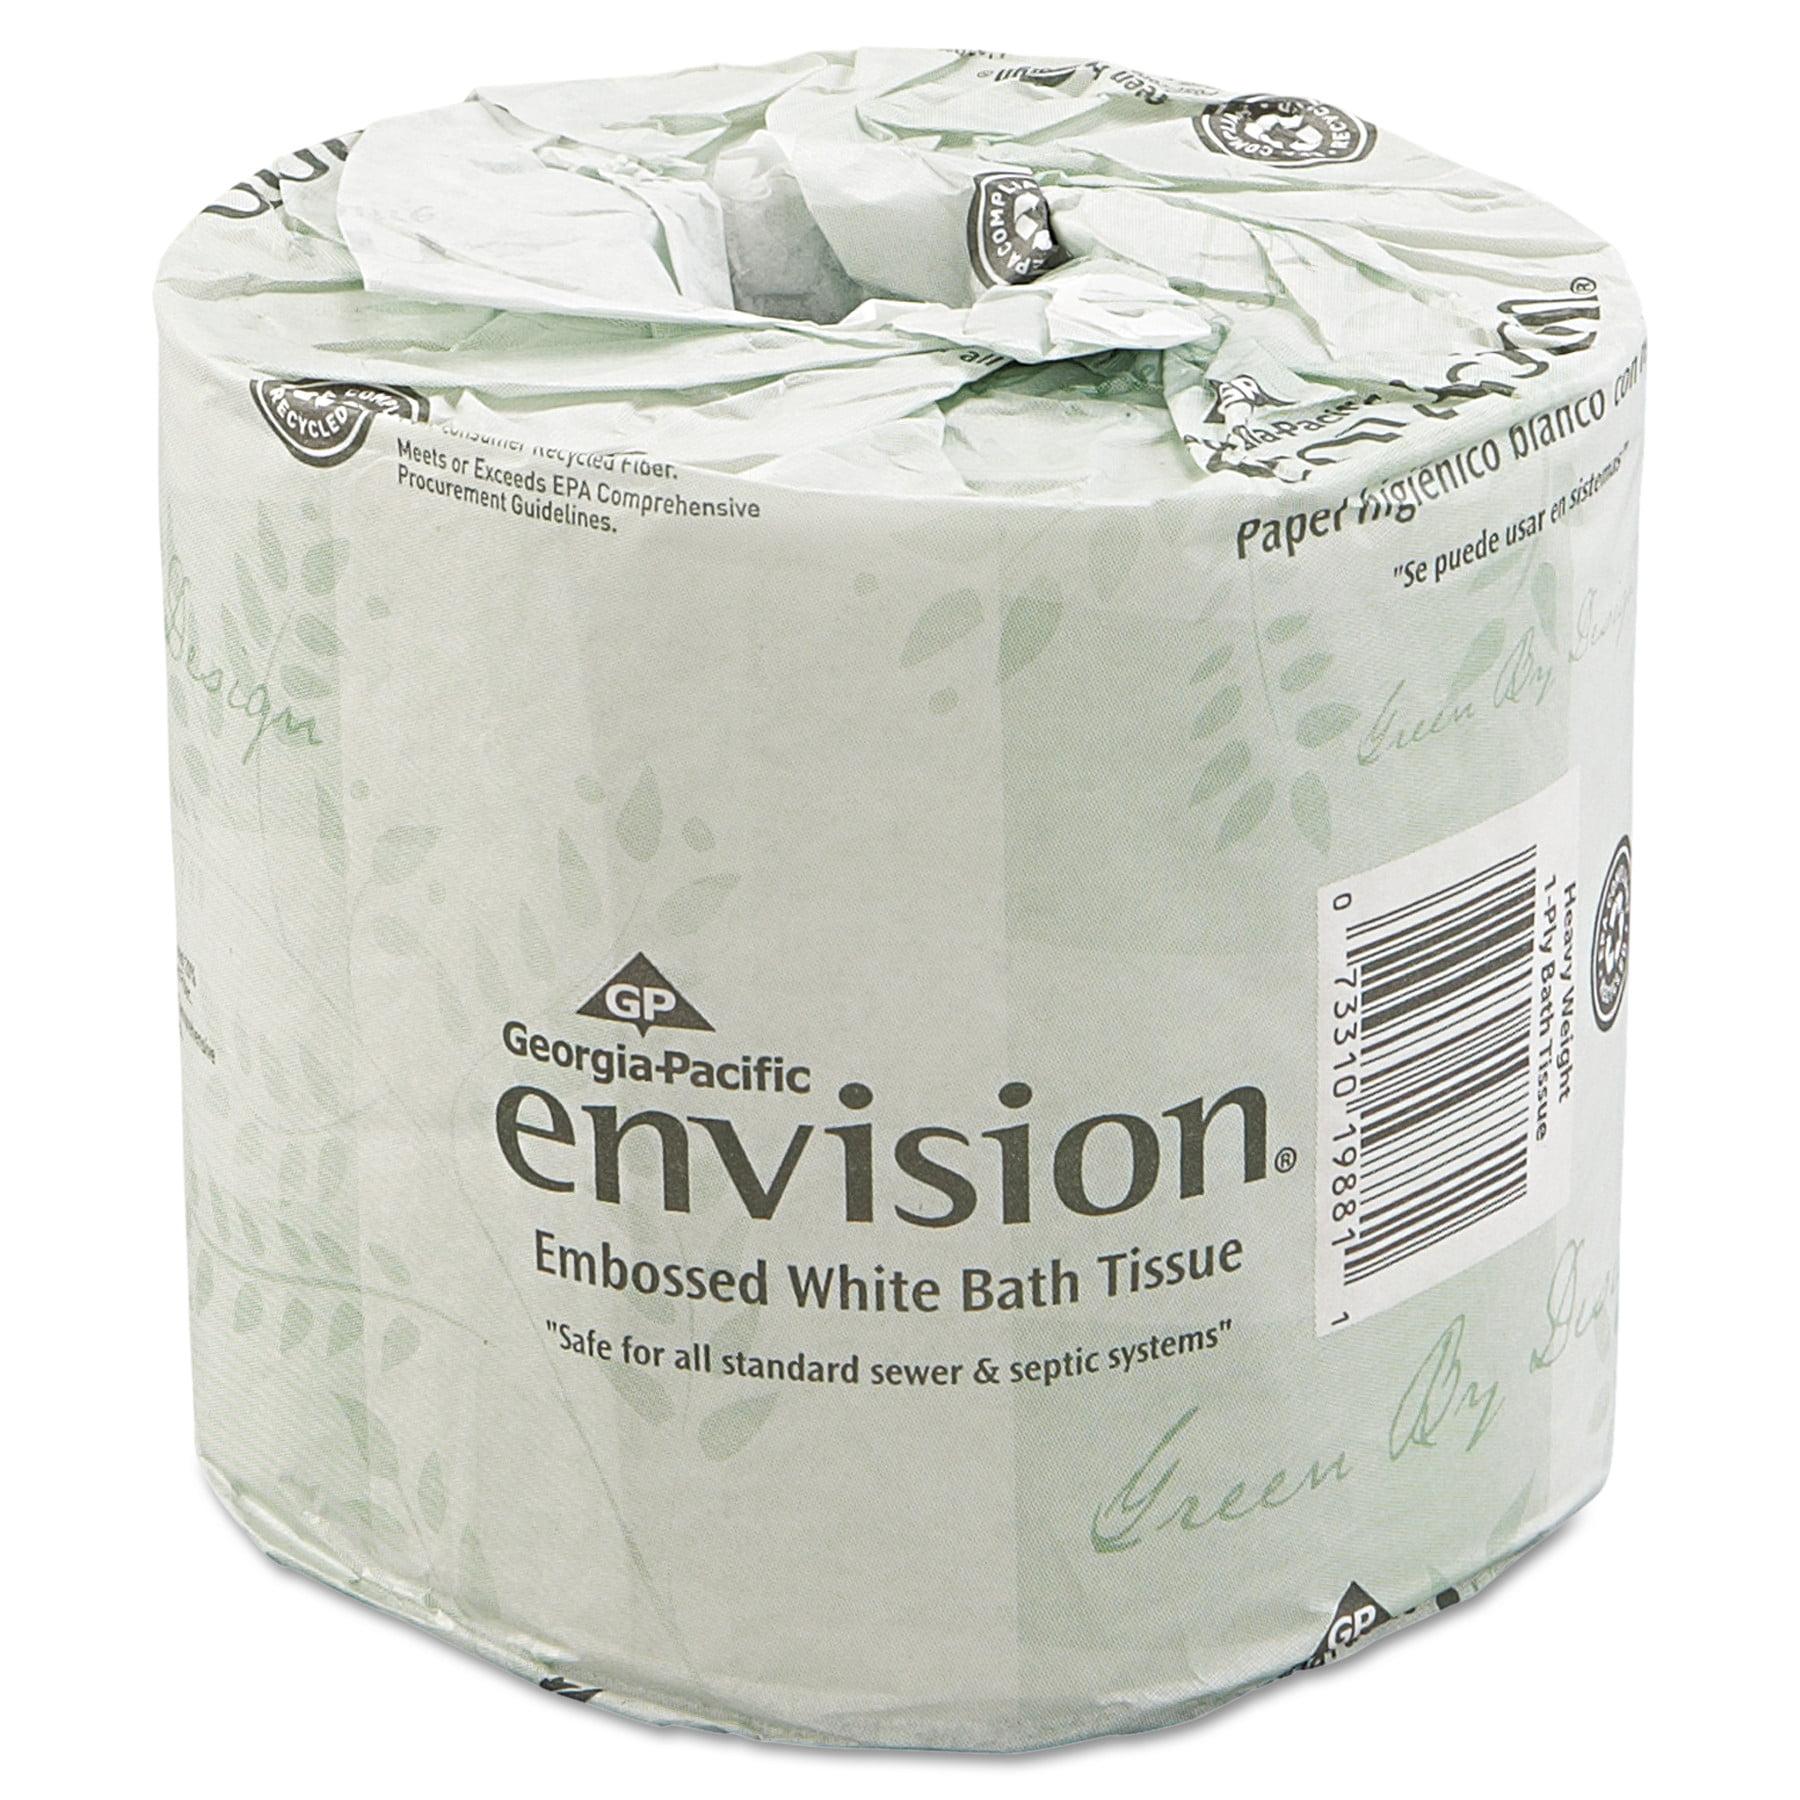 Georgia Pacific Envision Bathroom Tissue, 550 sheets, 80 ct